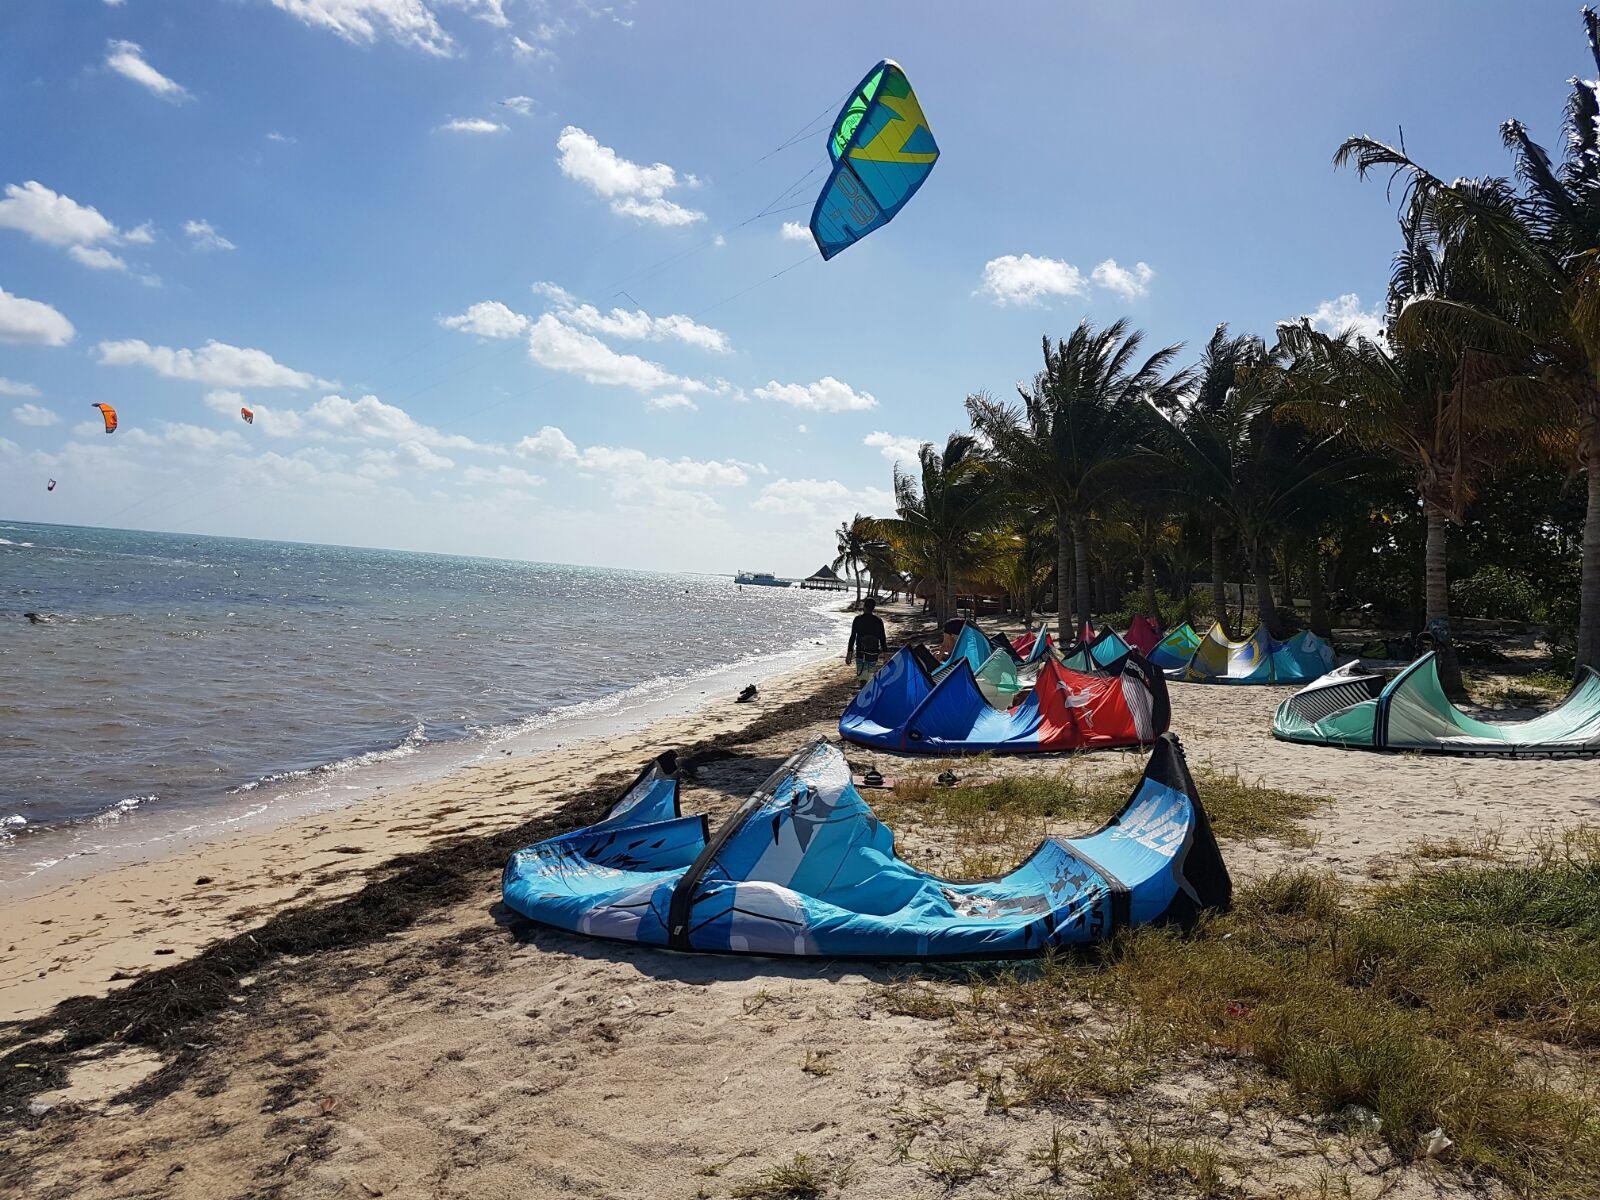 Venta kites usados